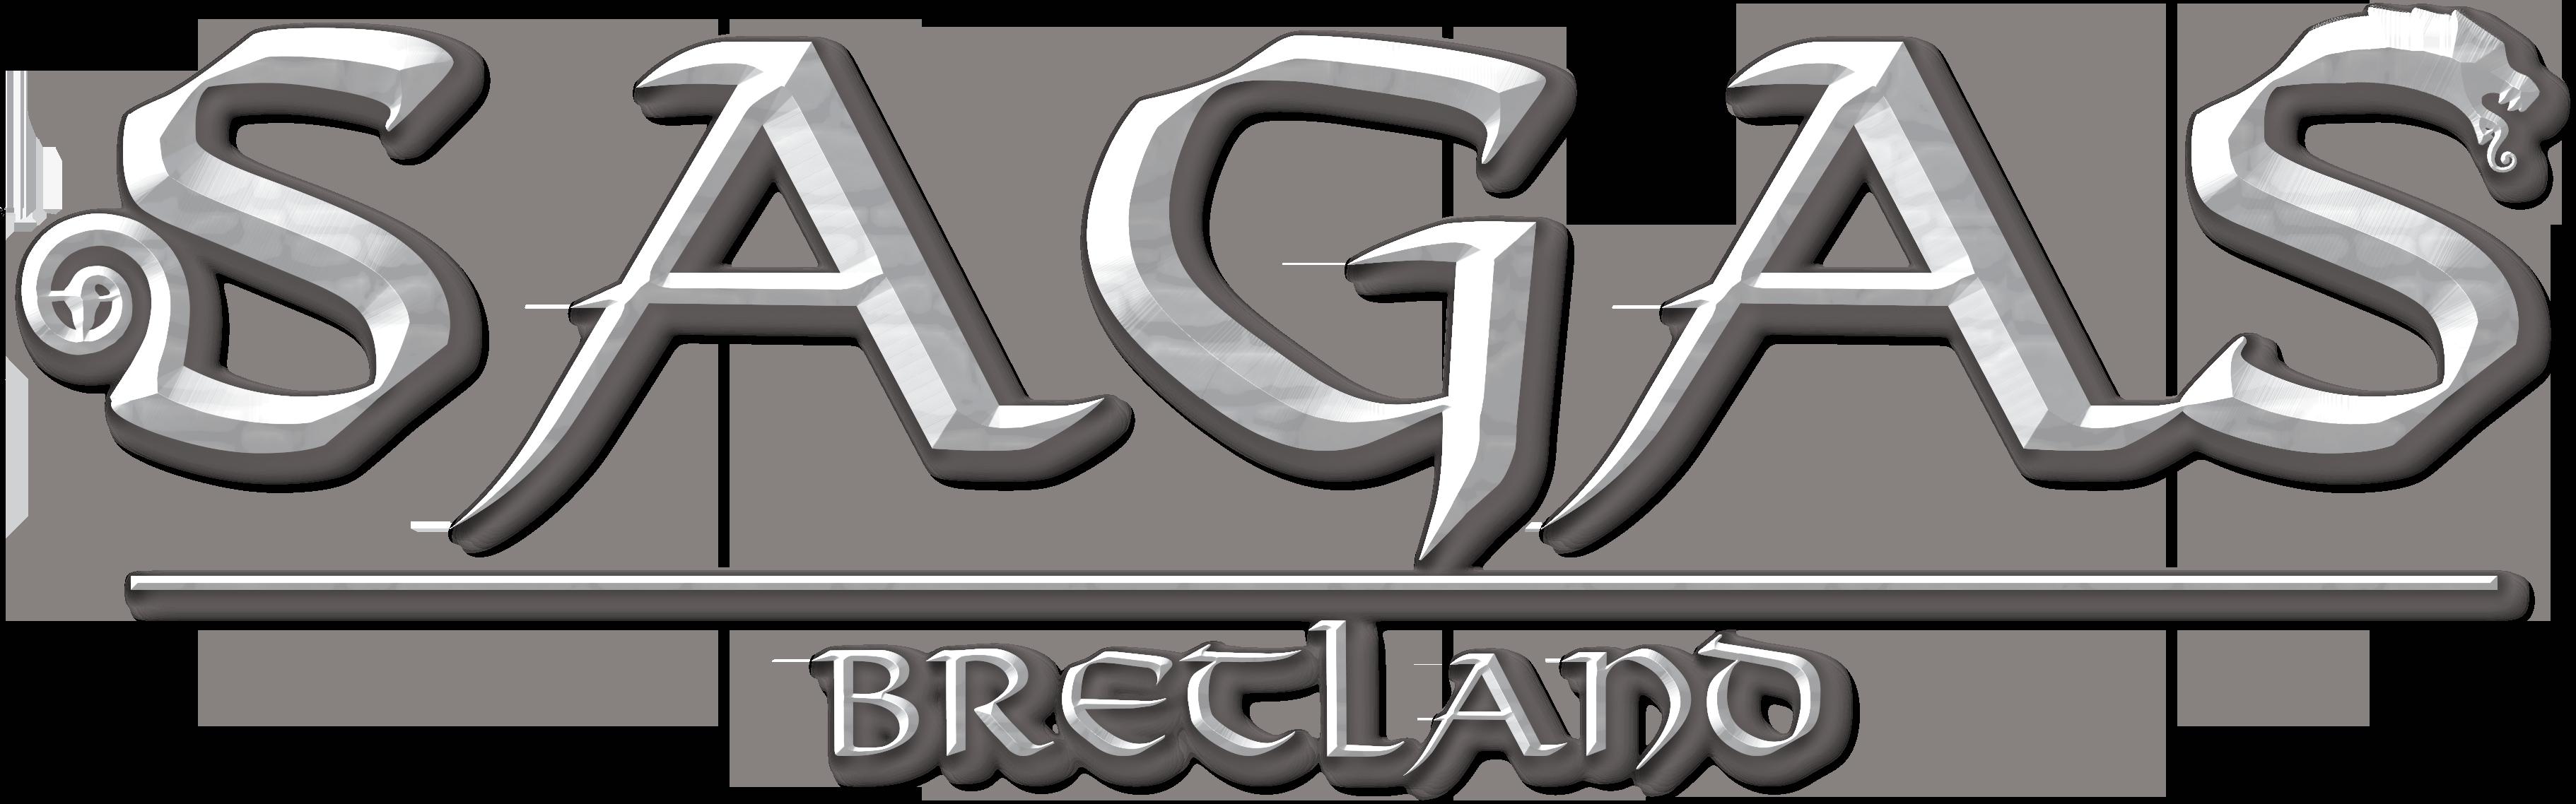 Sagas: Bretland